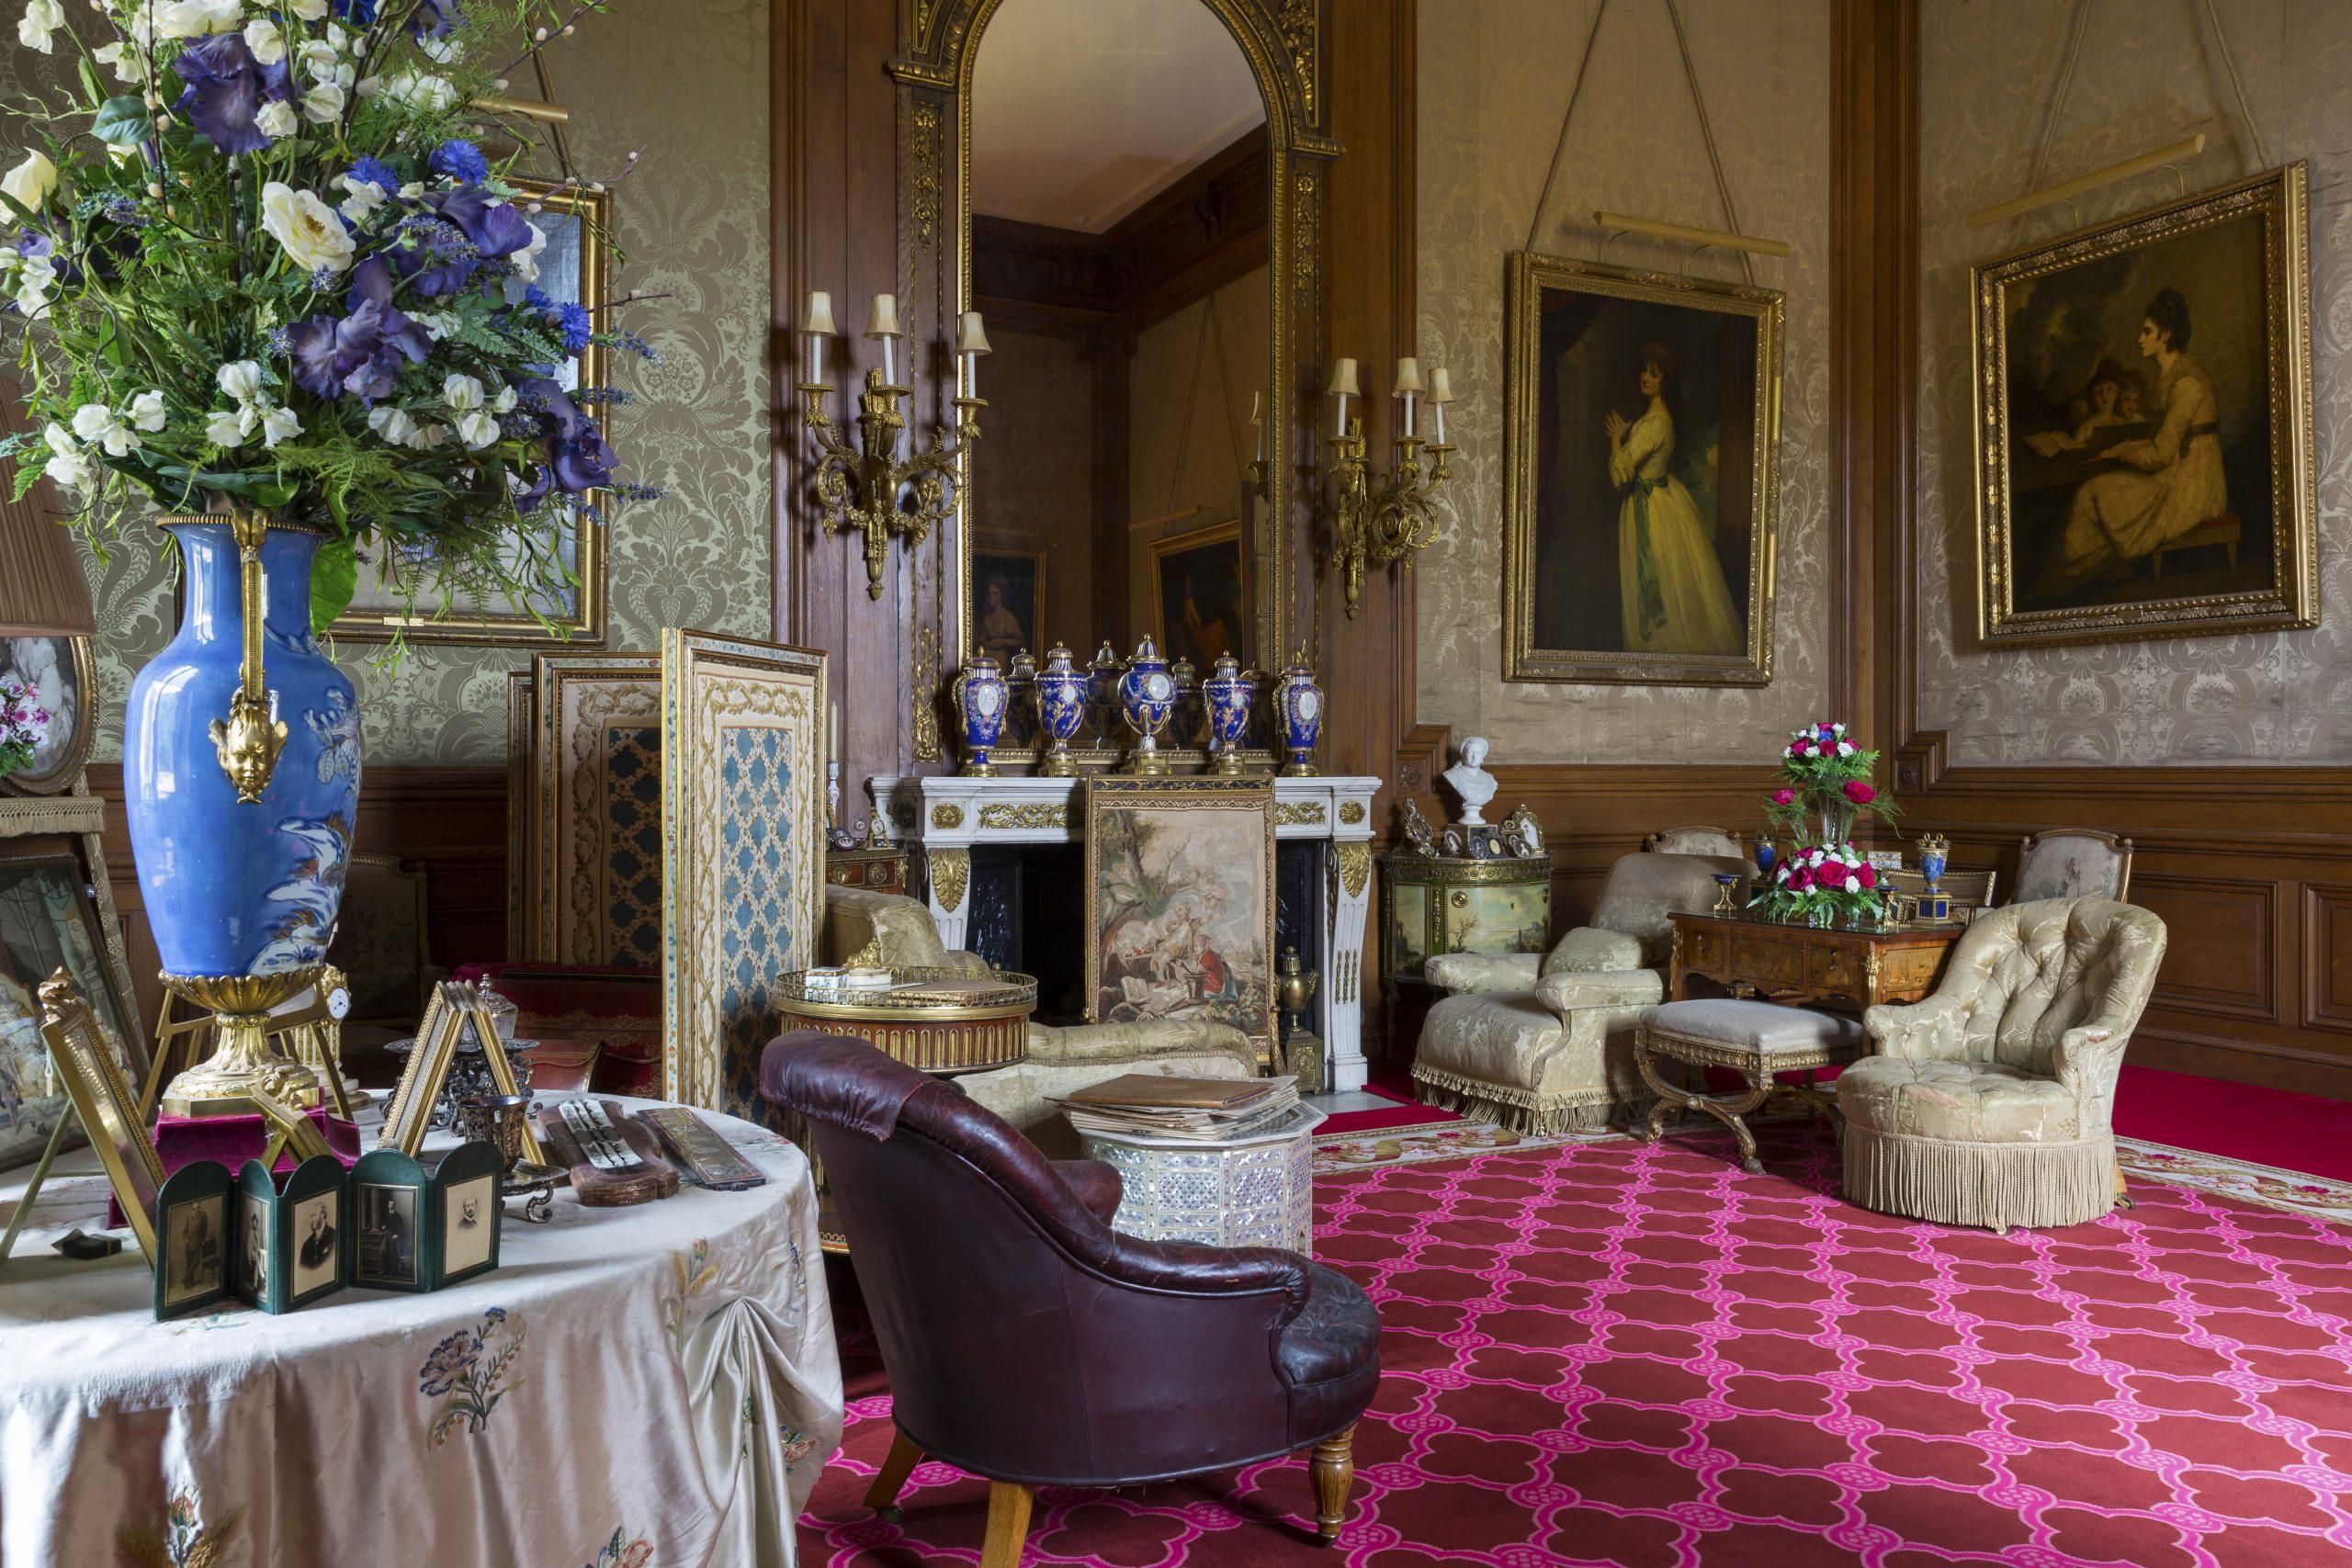 Baron's Room, Waddesdon Manor. Photo Chris Lacey (c) National Trust, Waddesdon Manor